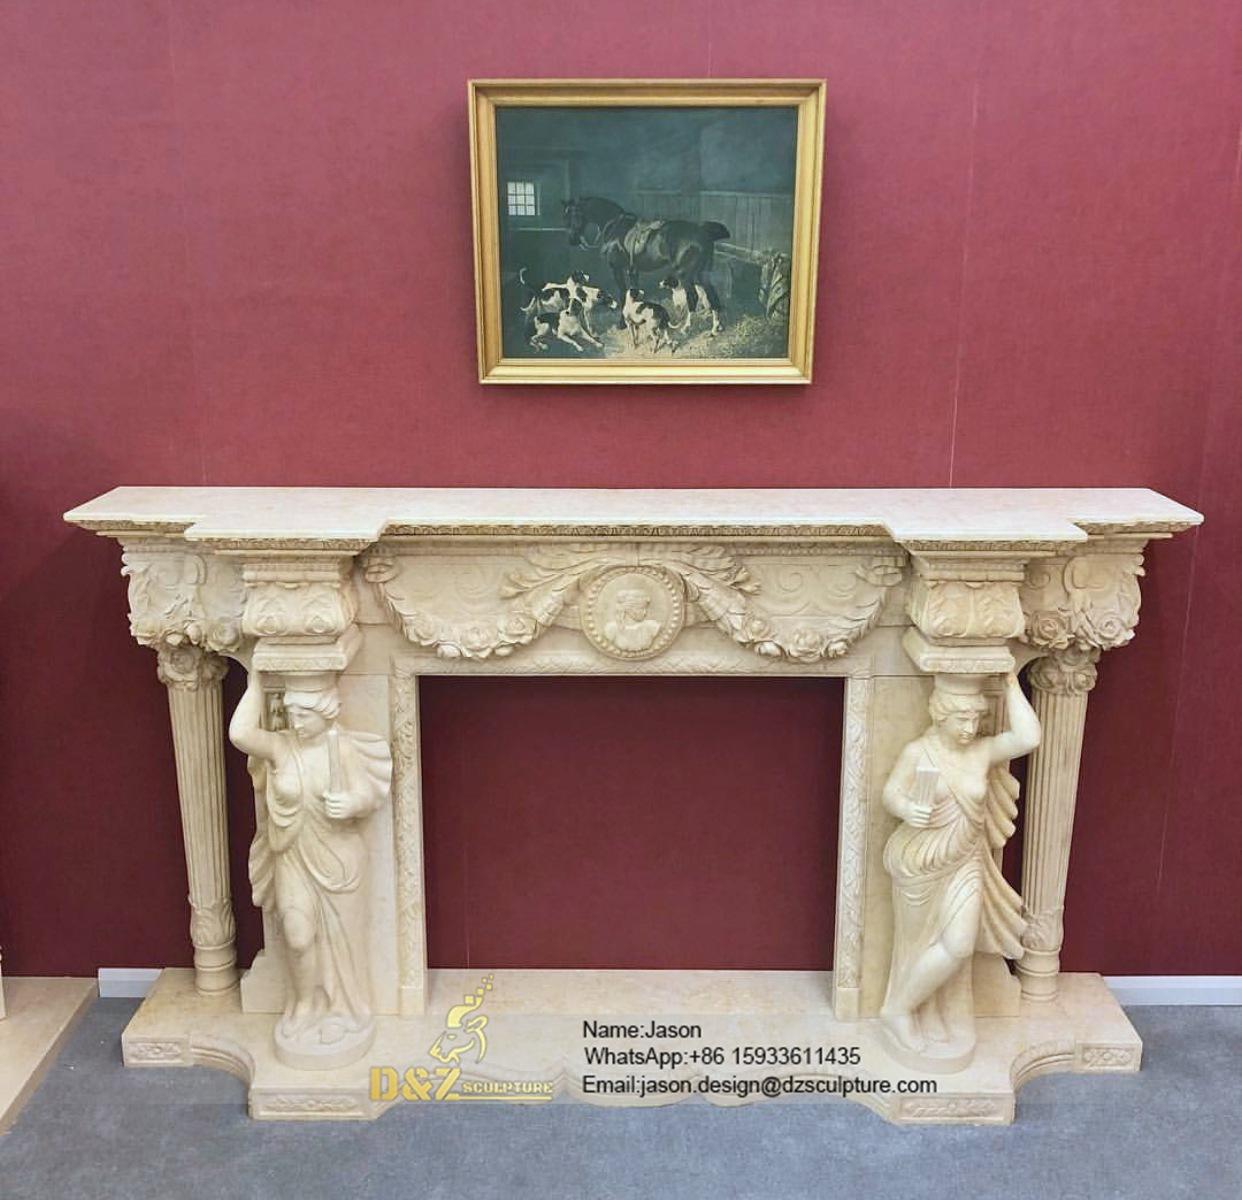 The stone veneer fireplace